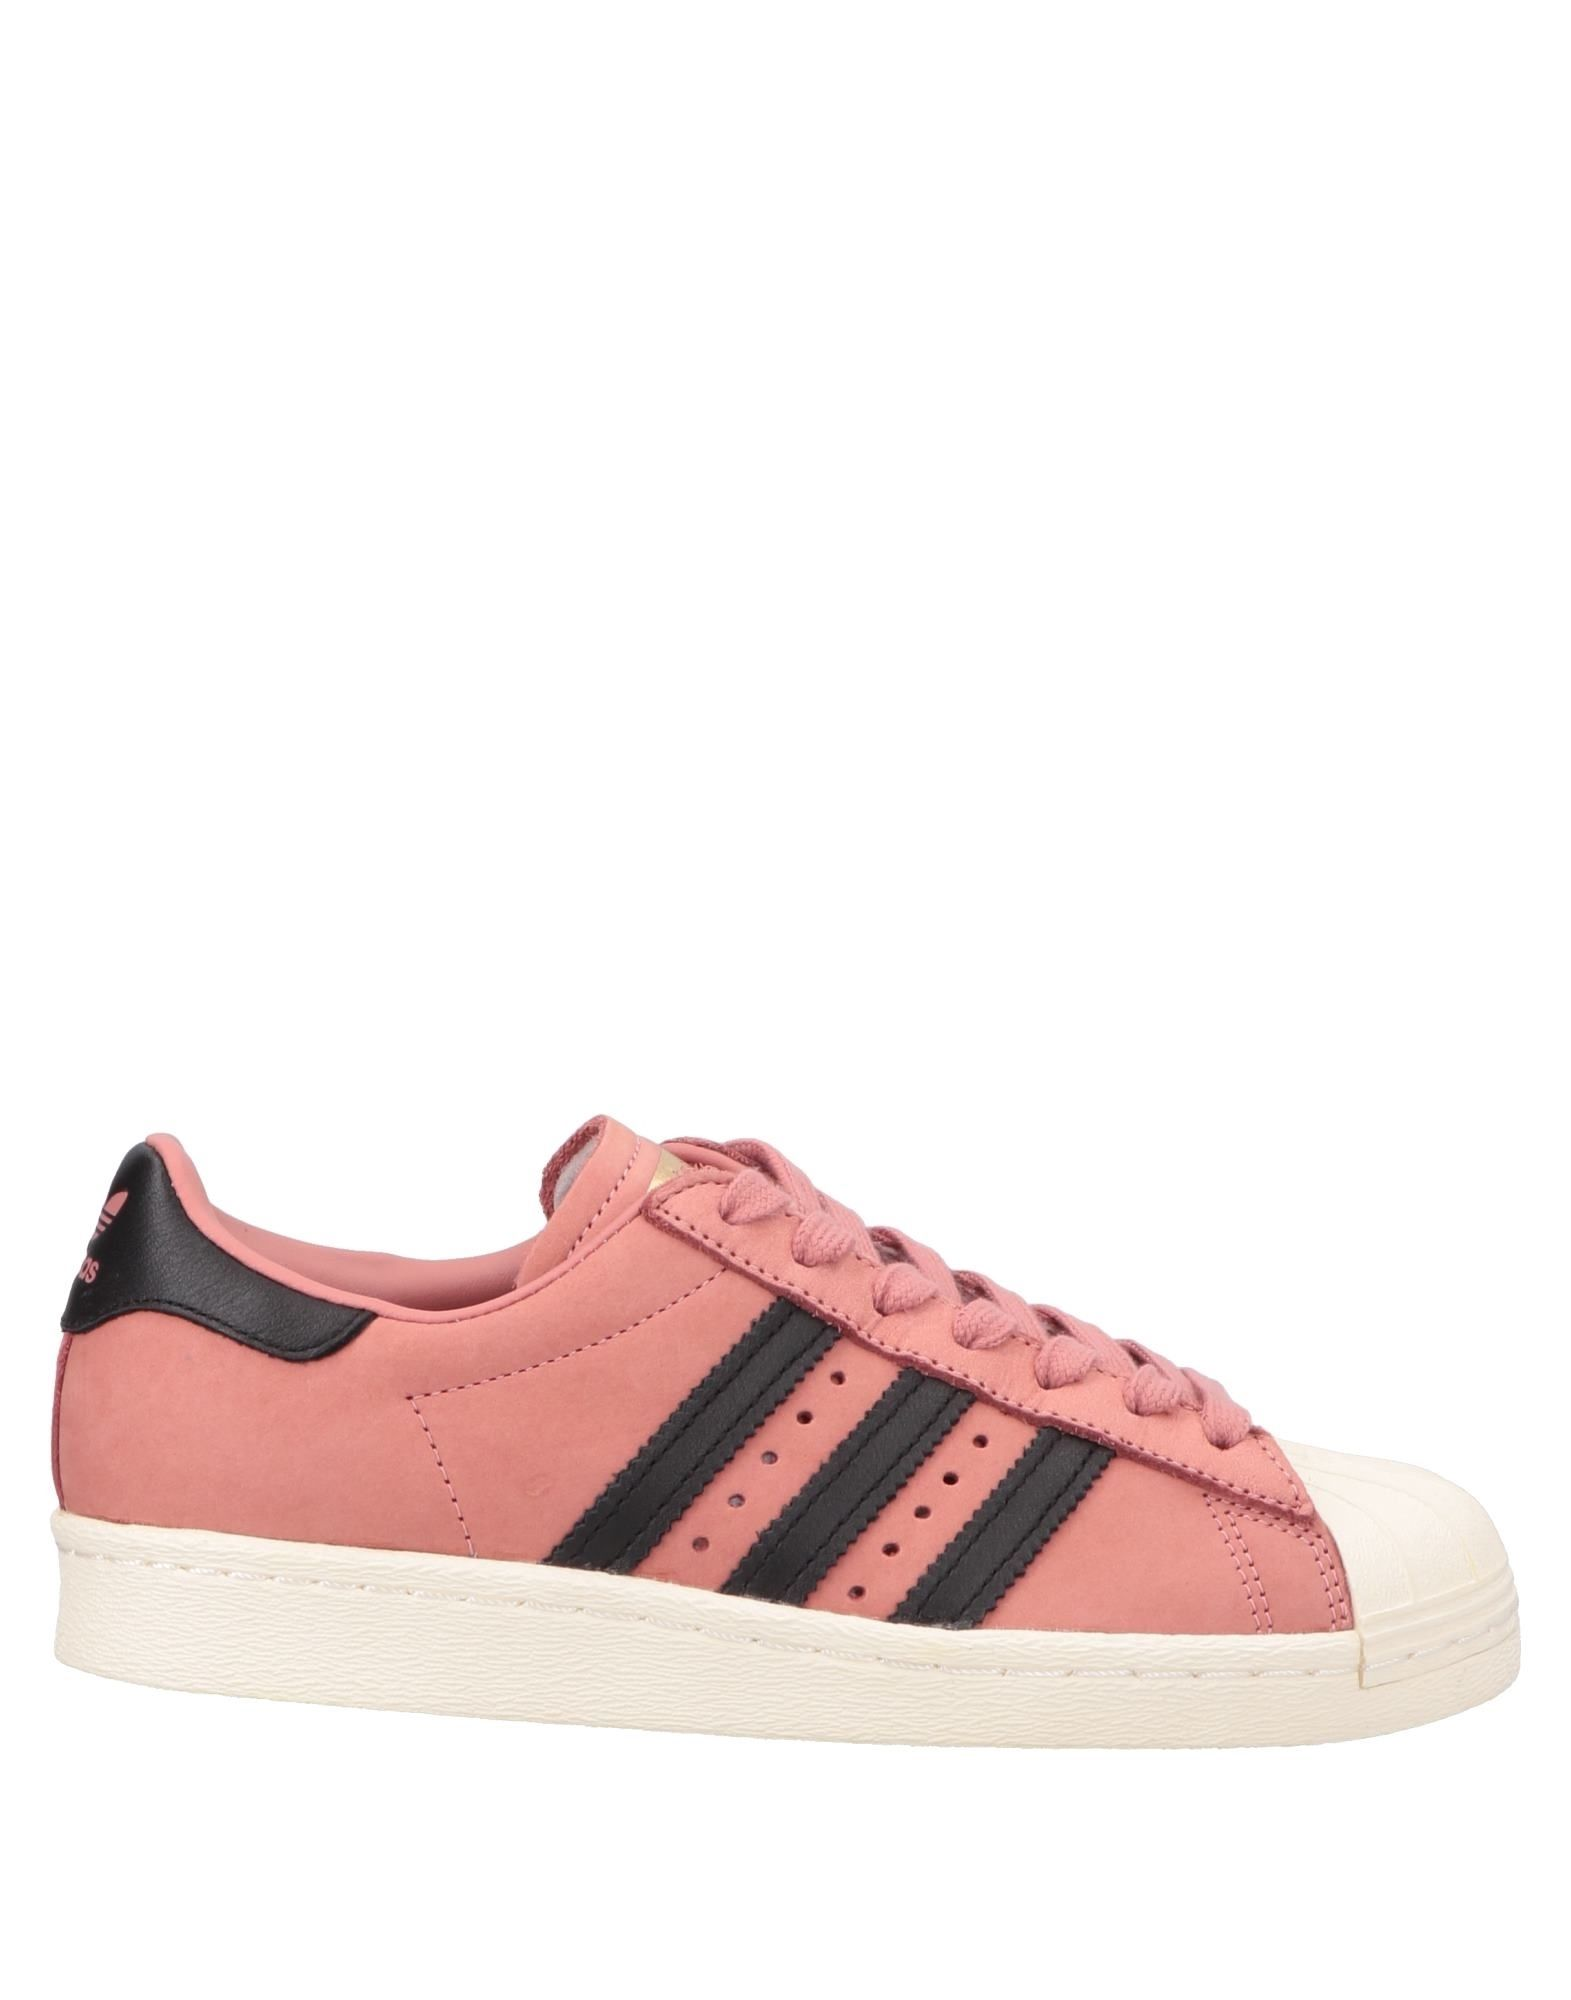 Adidas Originals Sneakers - online Women Adidas Originals Sneakers online - on  Canada - 11584896AC 113d57